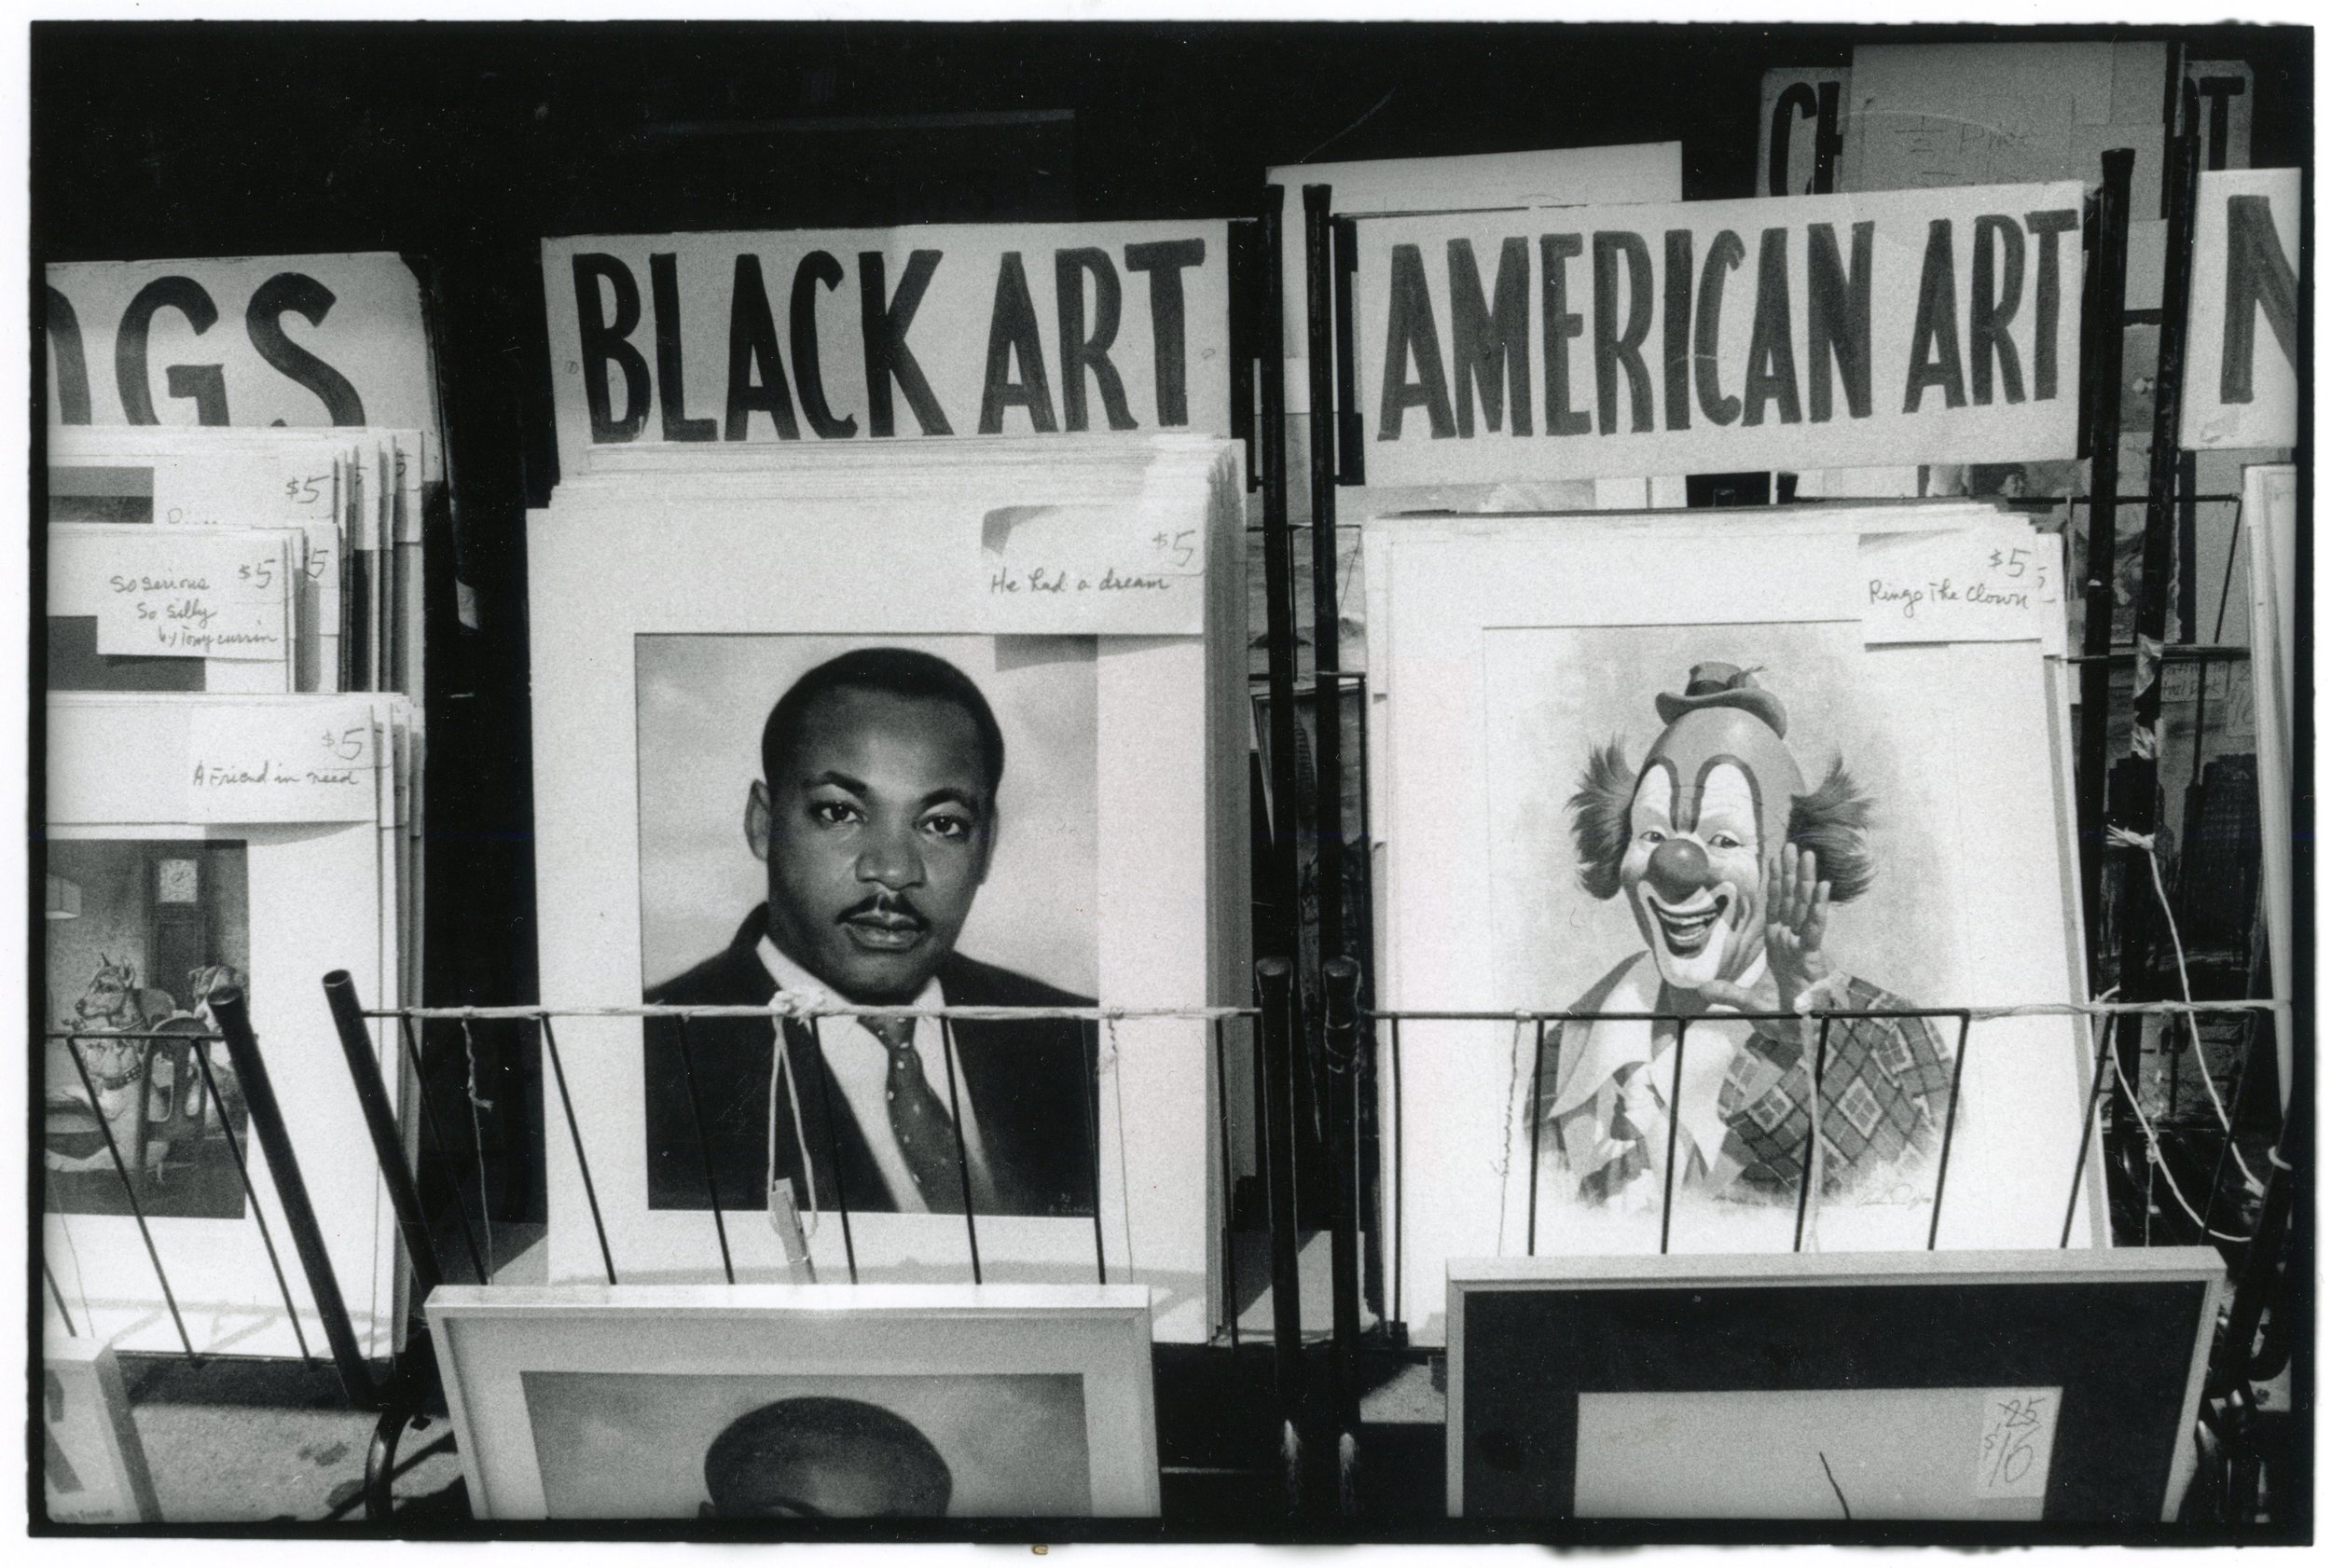 Black Art American Art, Times Square 1980